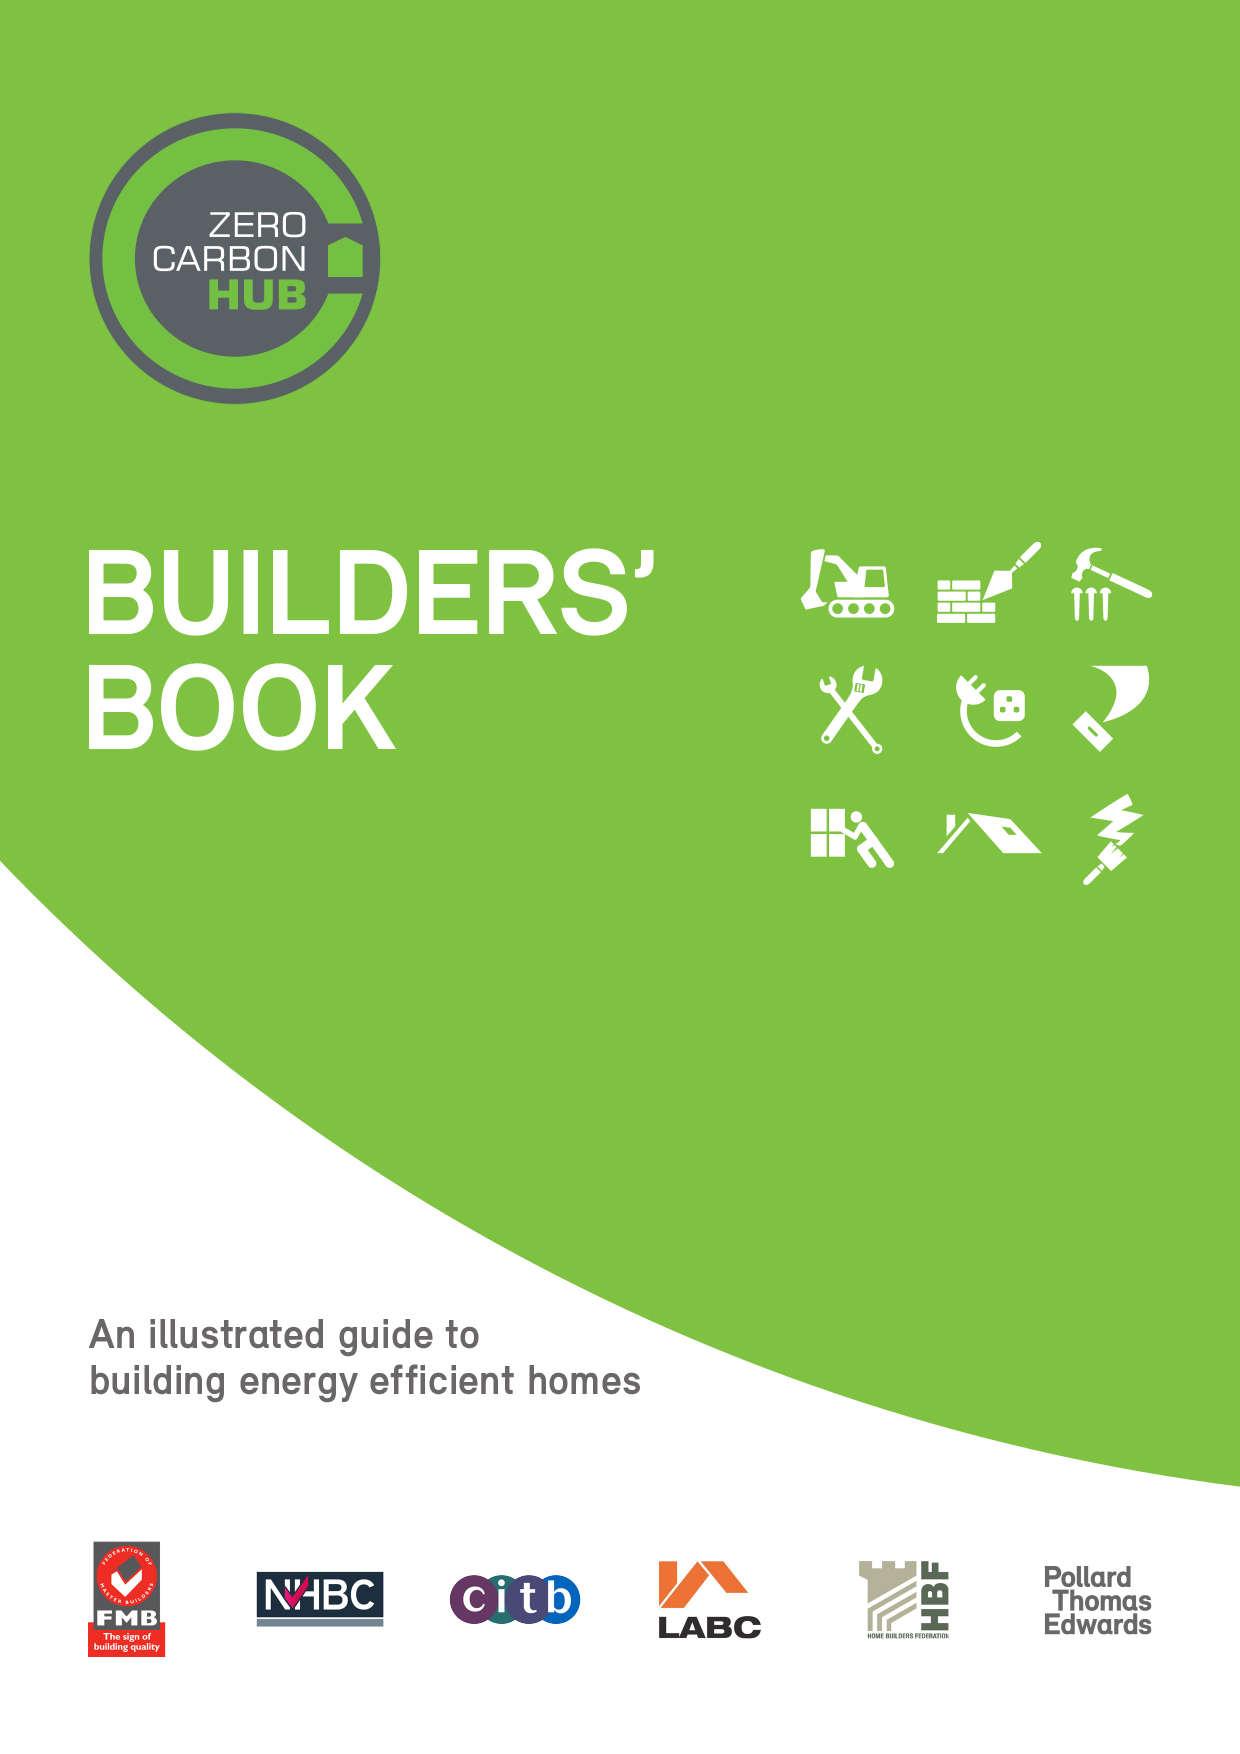 Builders' Book